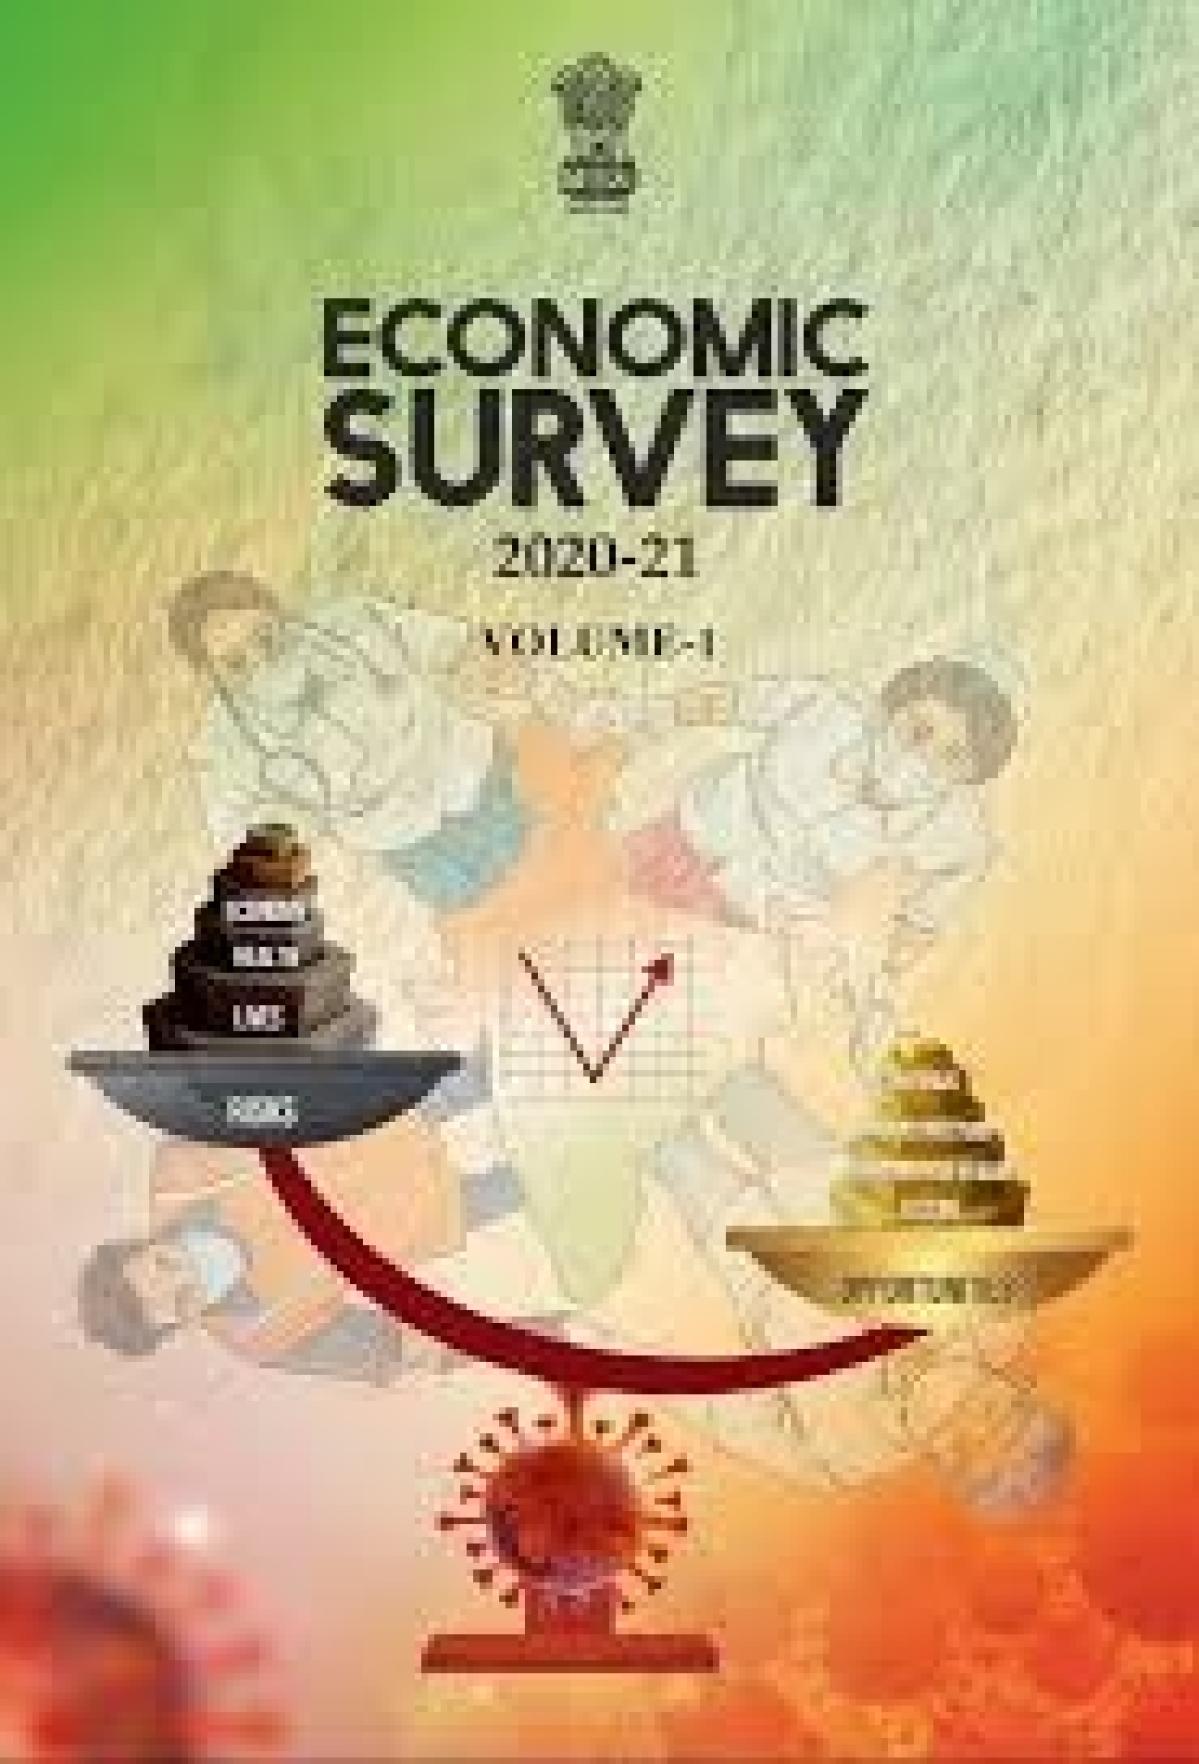 FPJ Edit: Economic Survey 2020-'21 has sensibly advised ample  loosening of the purse-strings